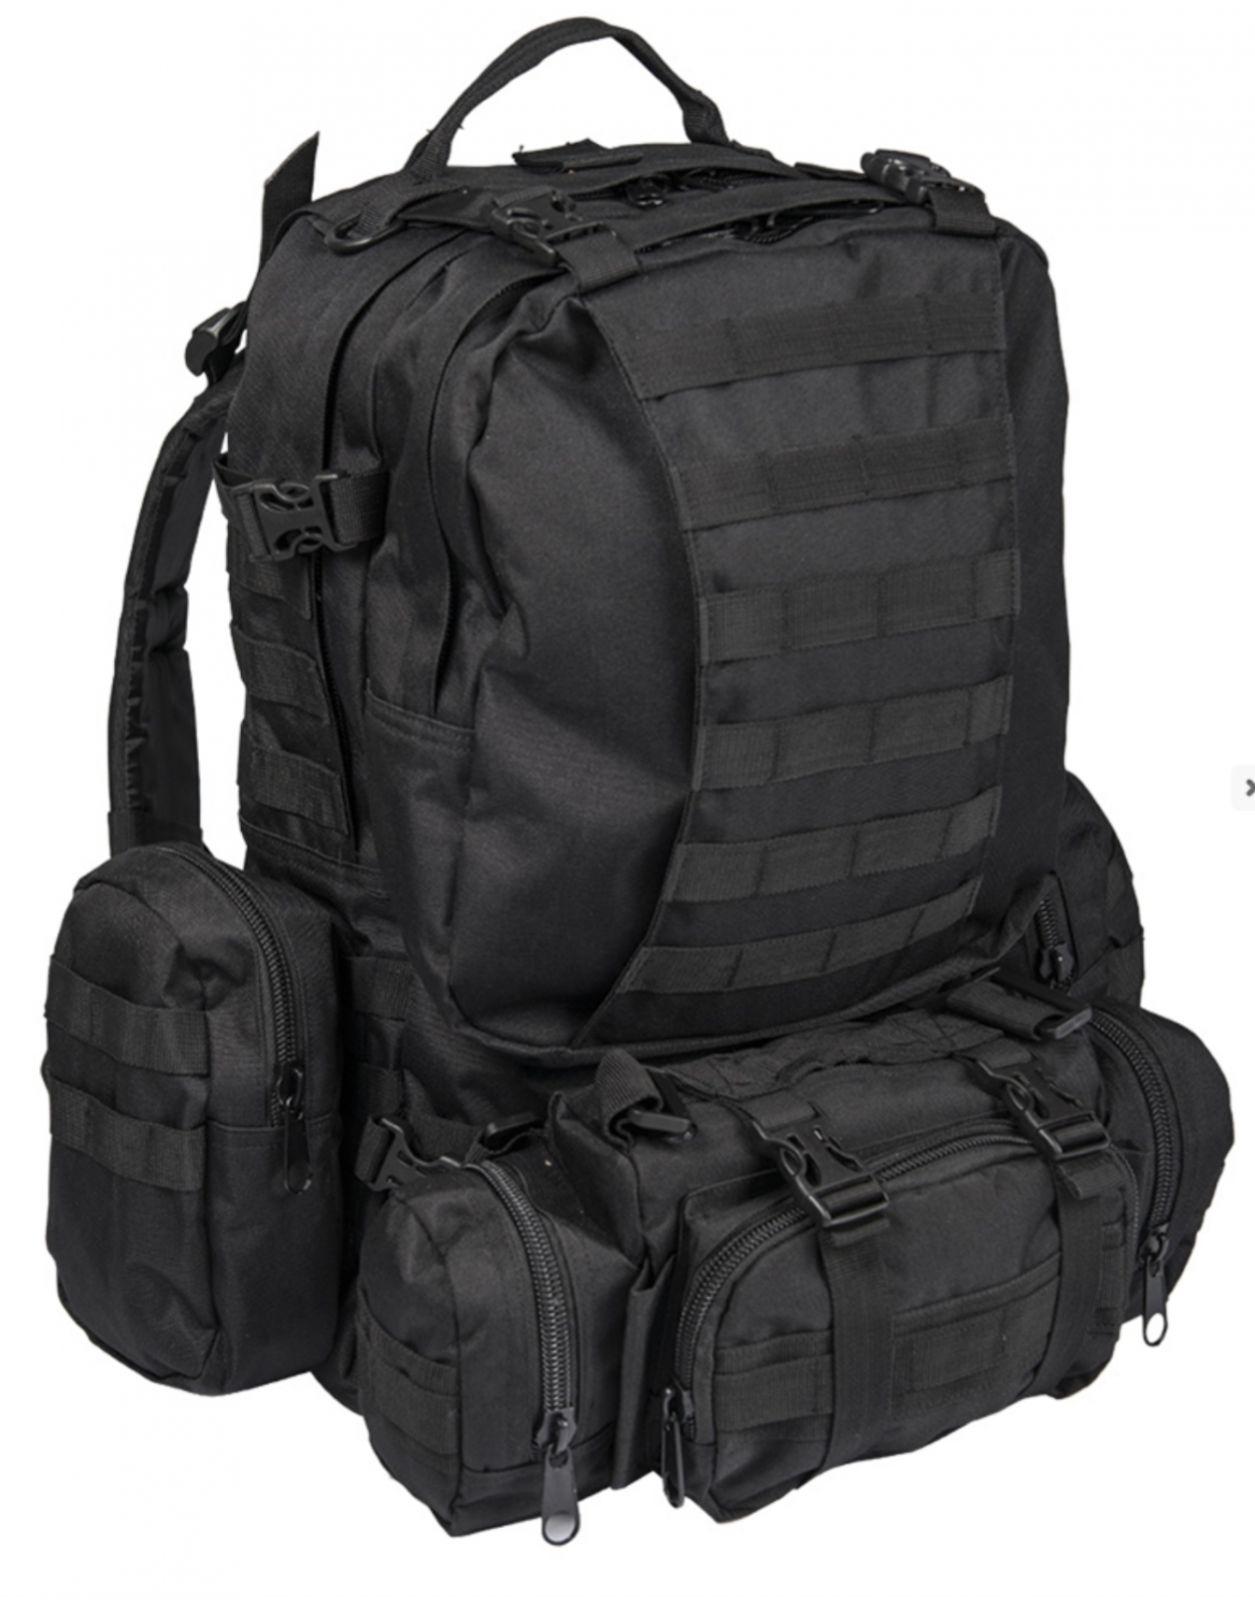 Batoh Defense modular černý